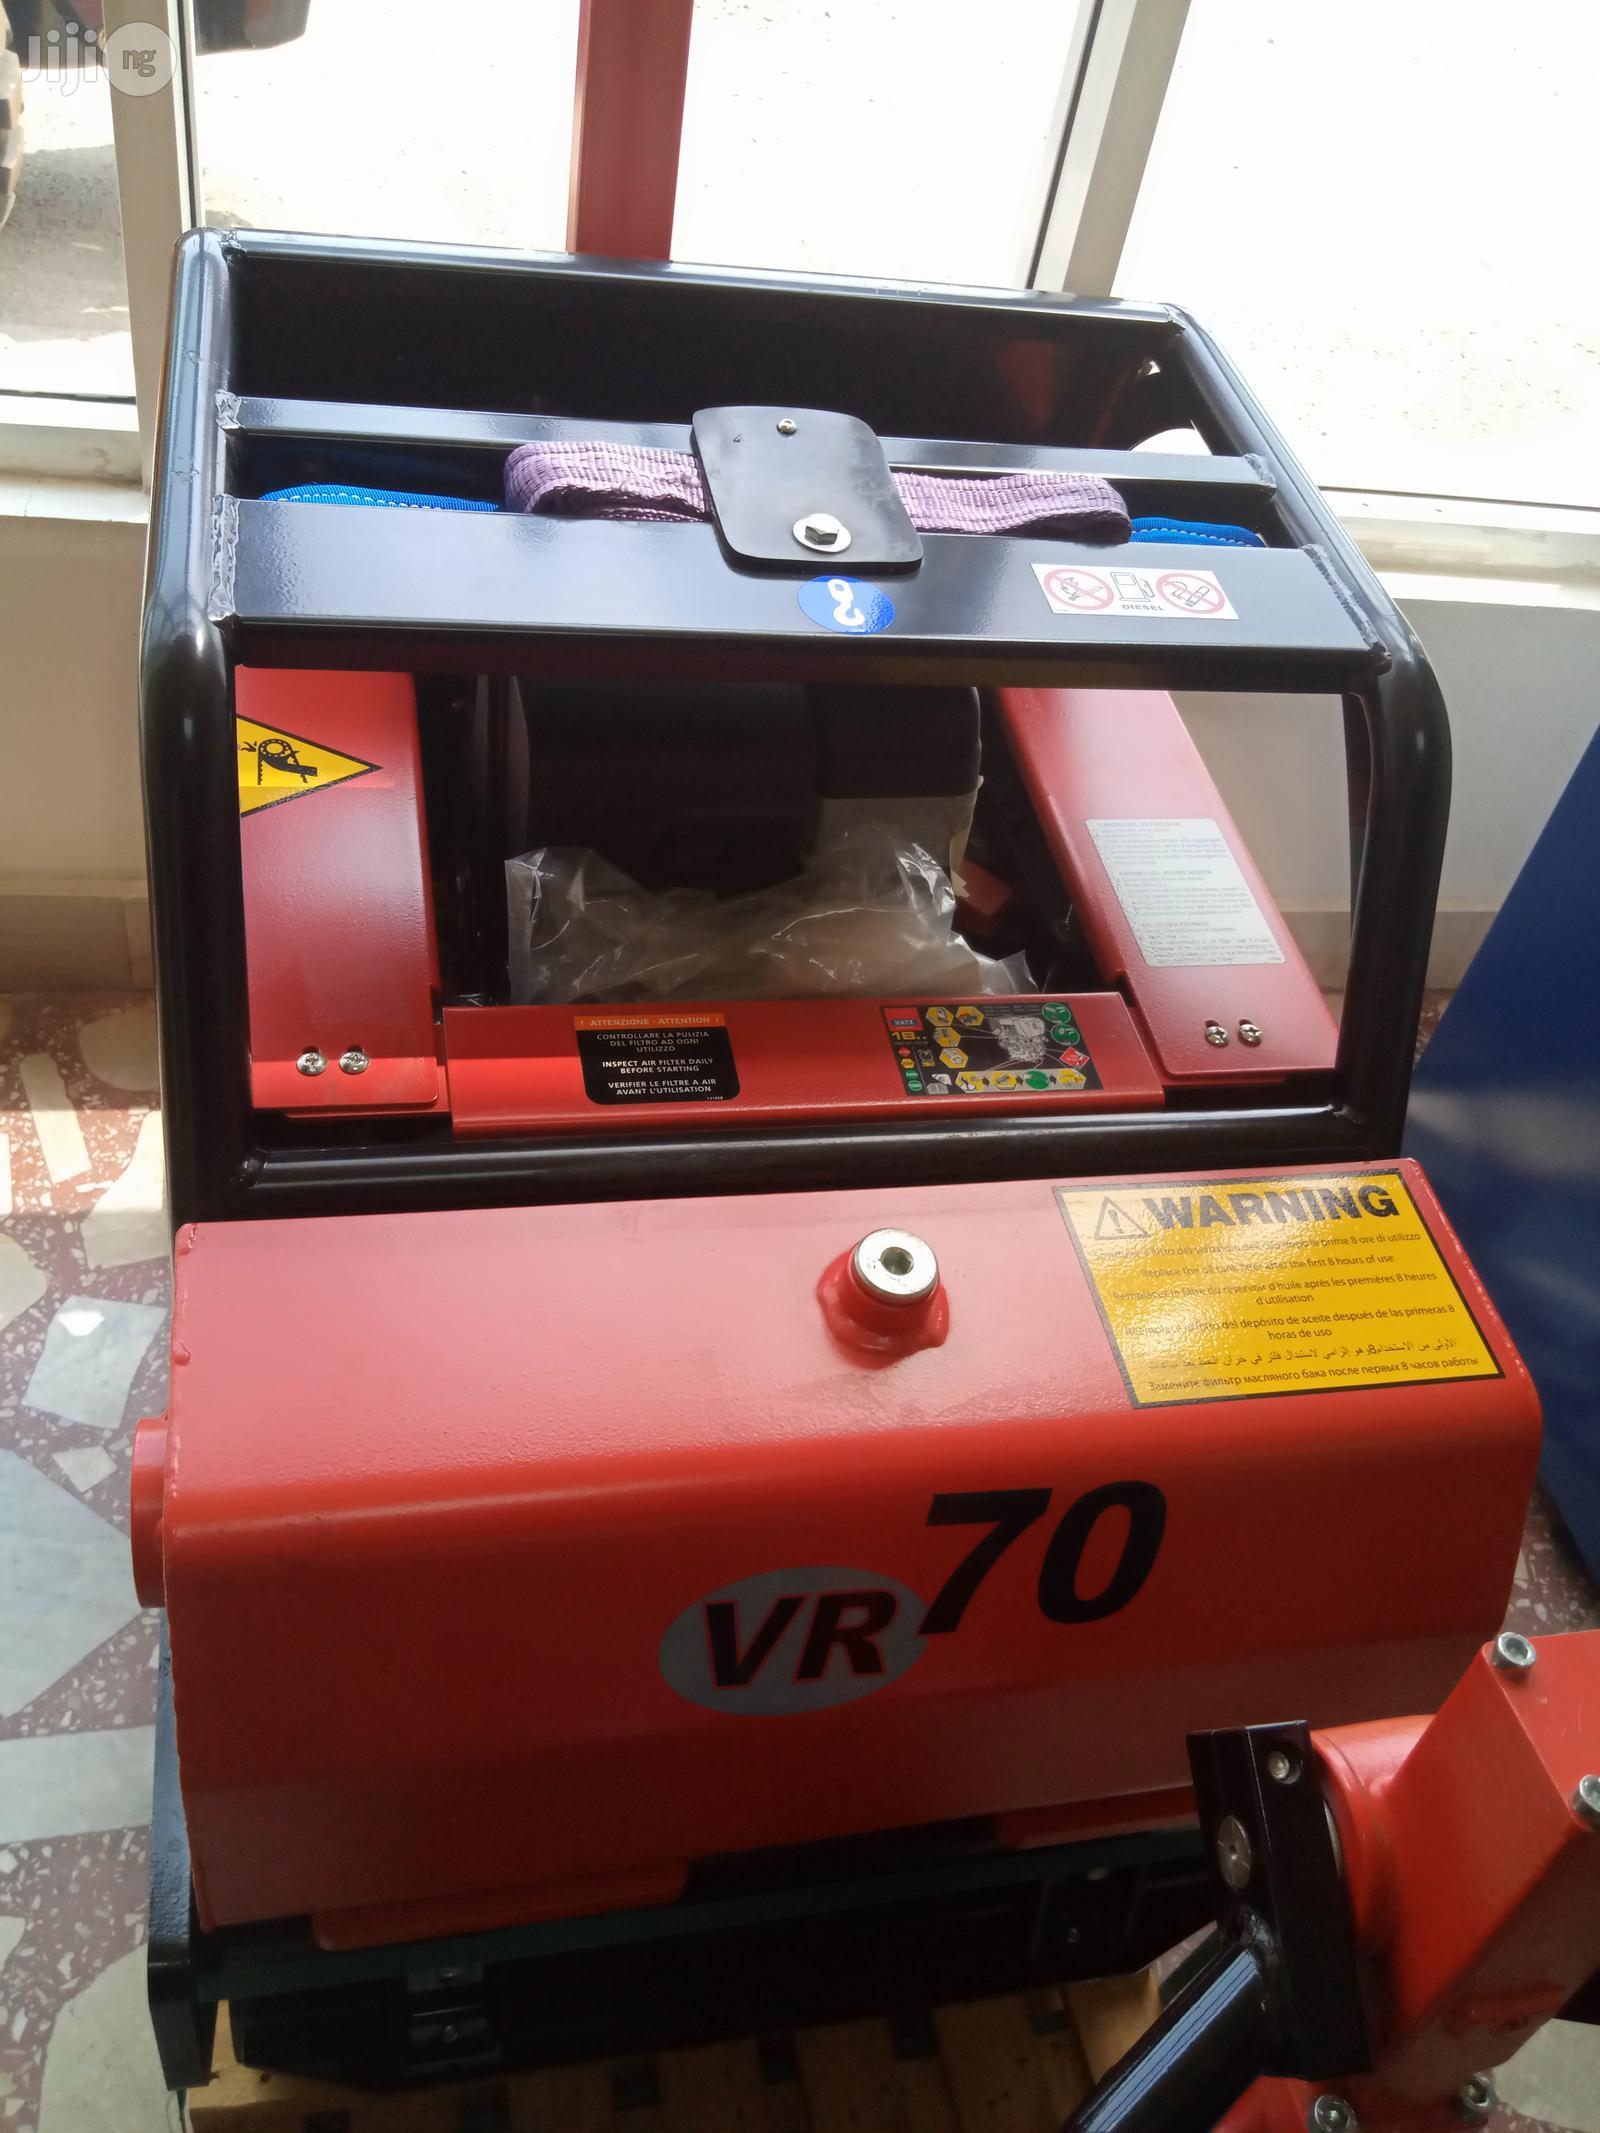 Archive: Batmatic VR70 Twin Drum Roller